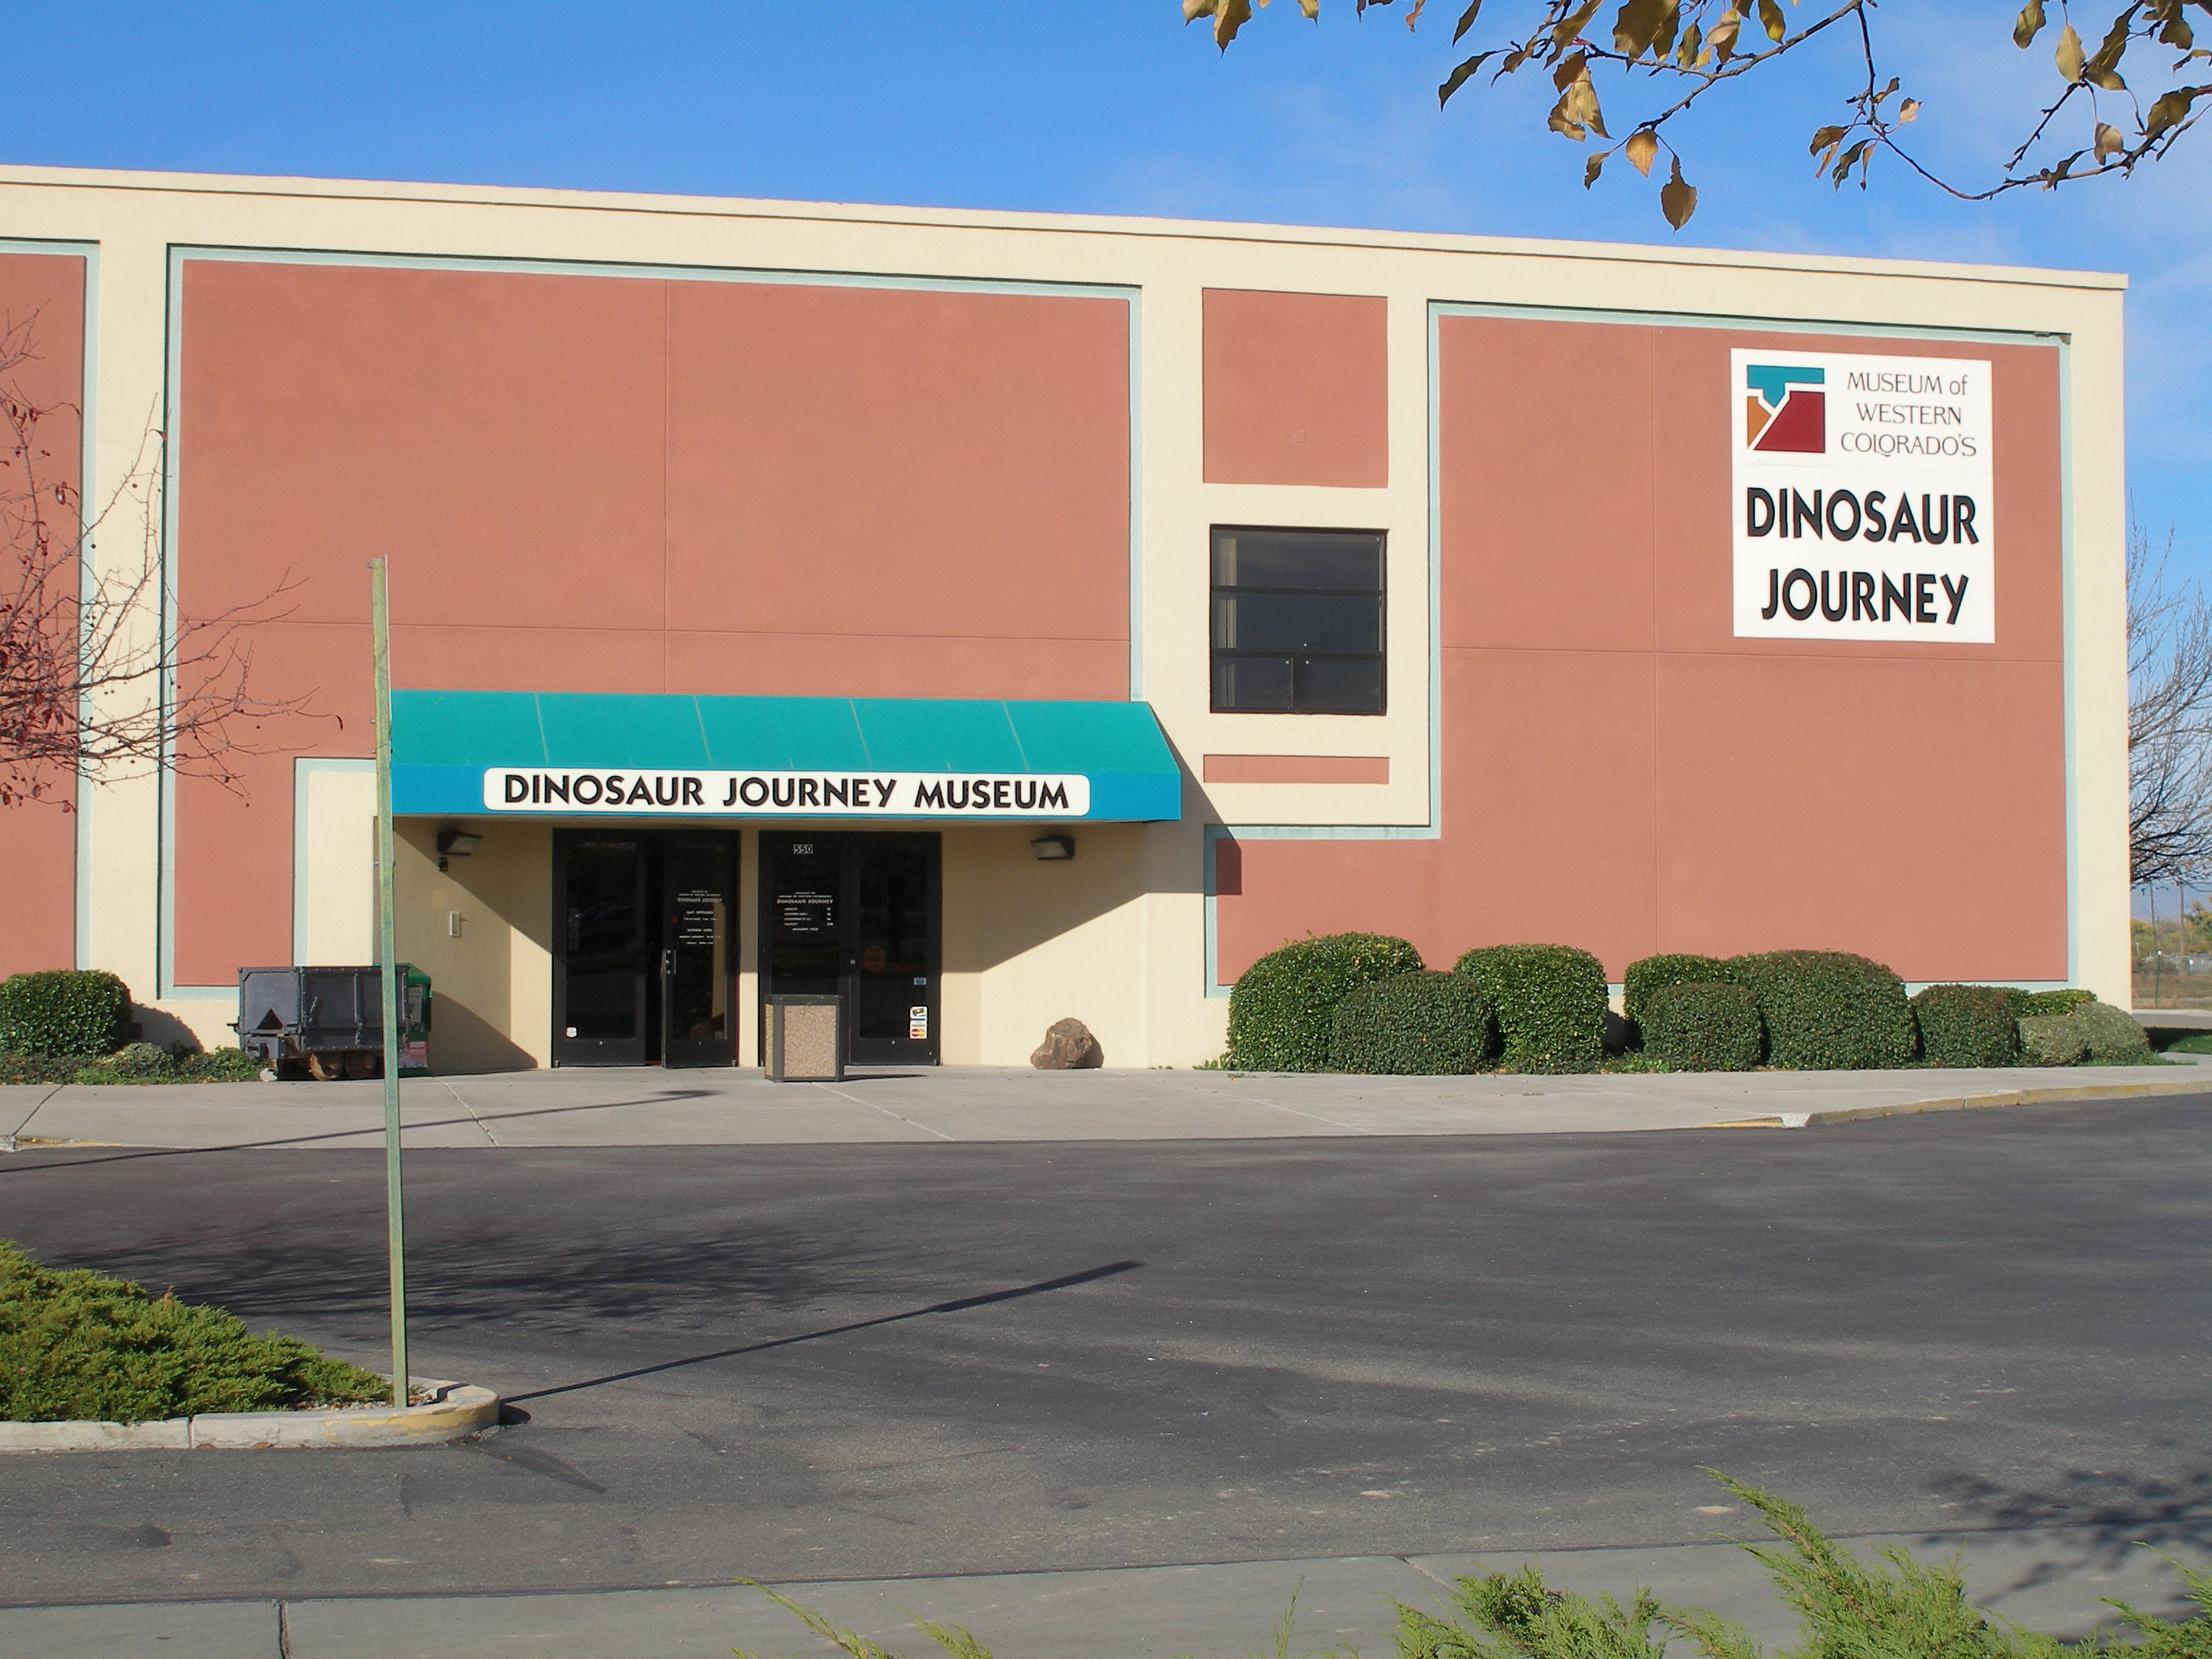 Dinosaur Journey Museum detail image